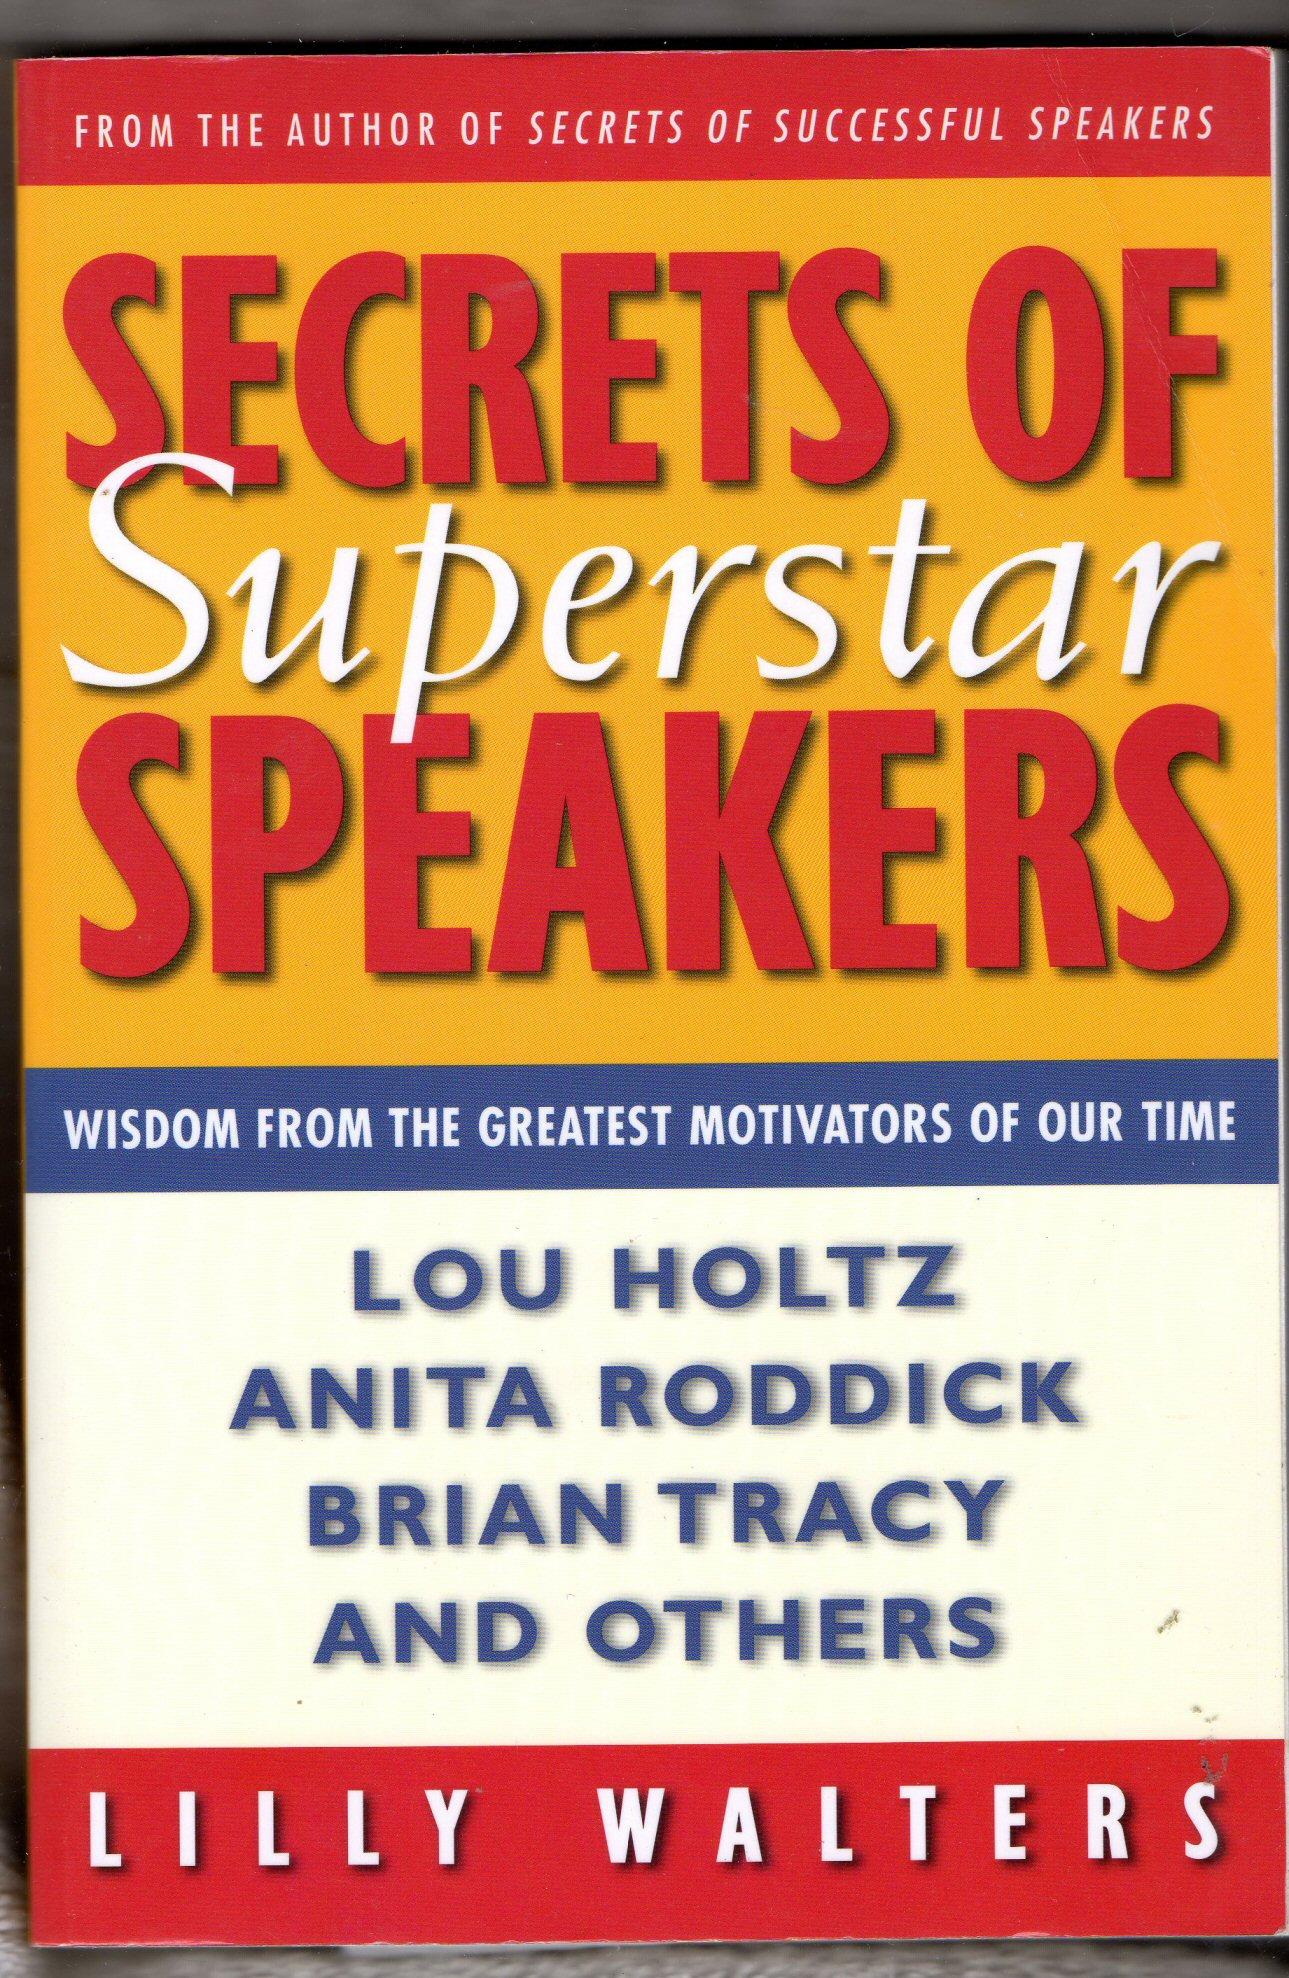 Secrets of Superstar Speakers